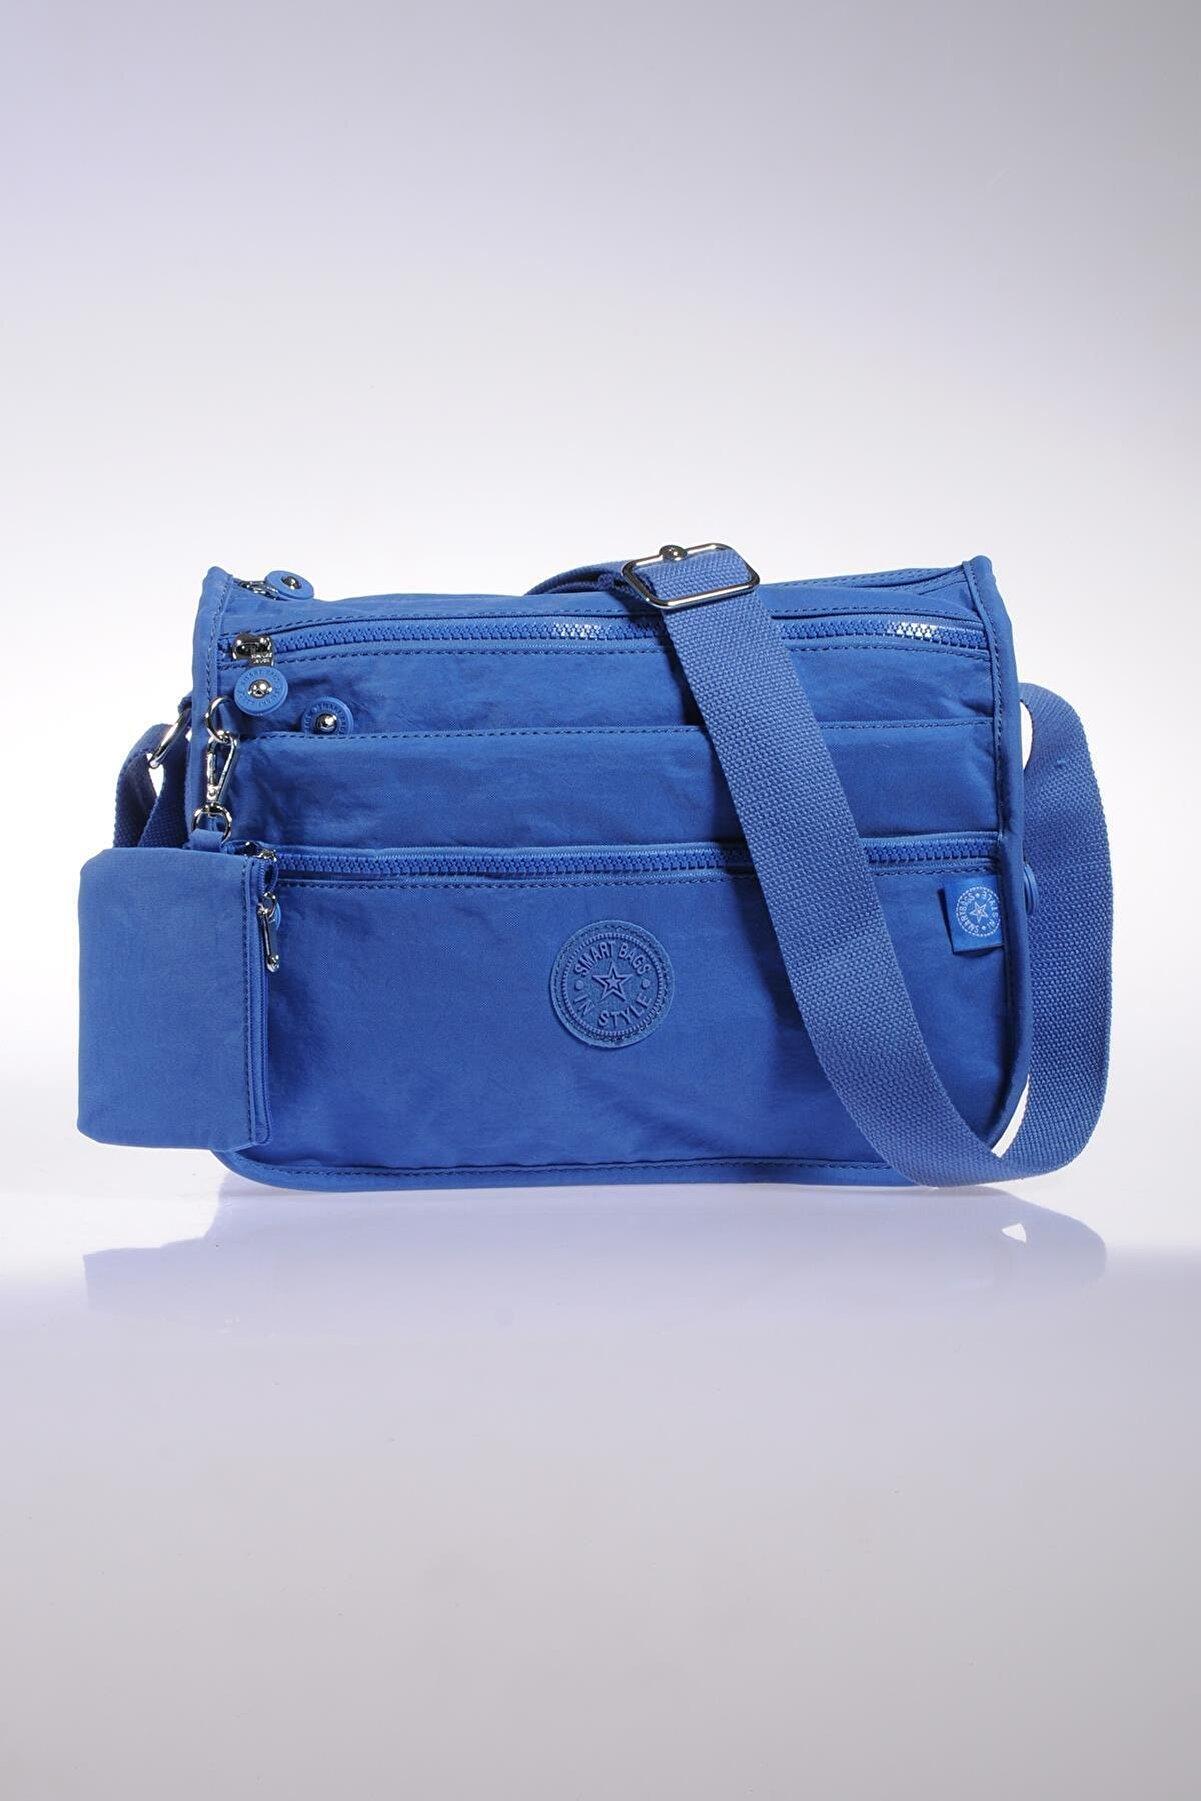 Smart Bags Smb1128-0031 N.mavi Kadın Çapraz Çanta